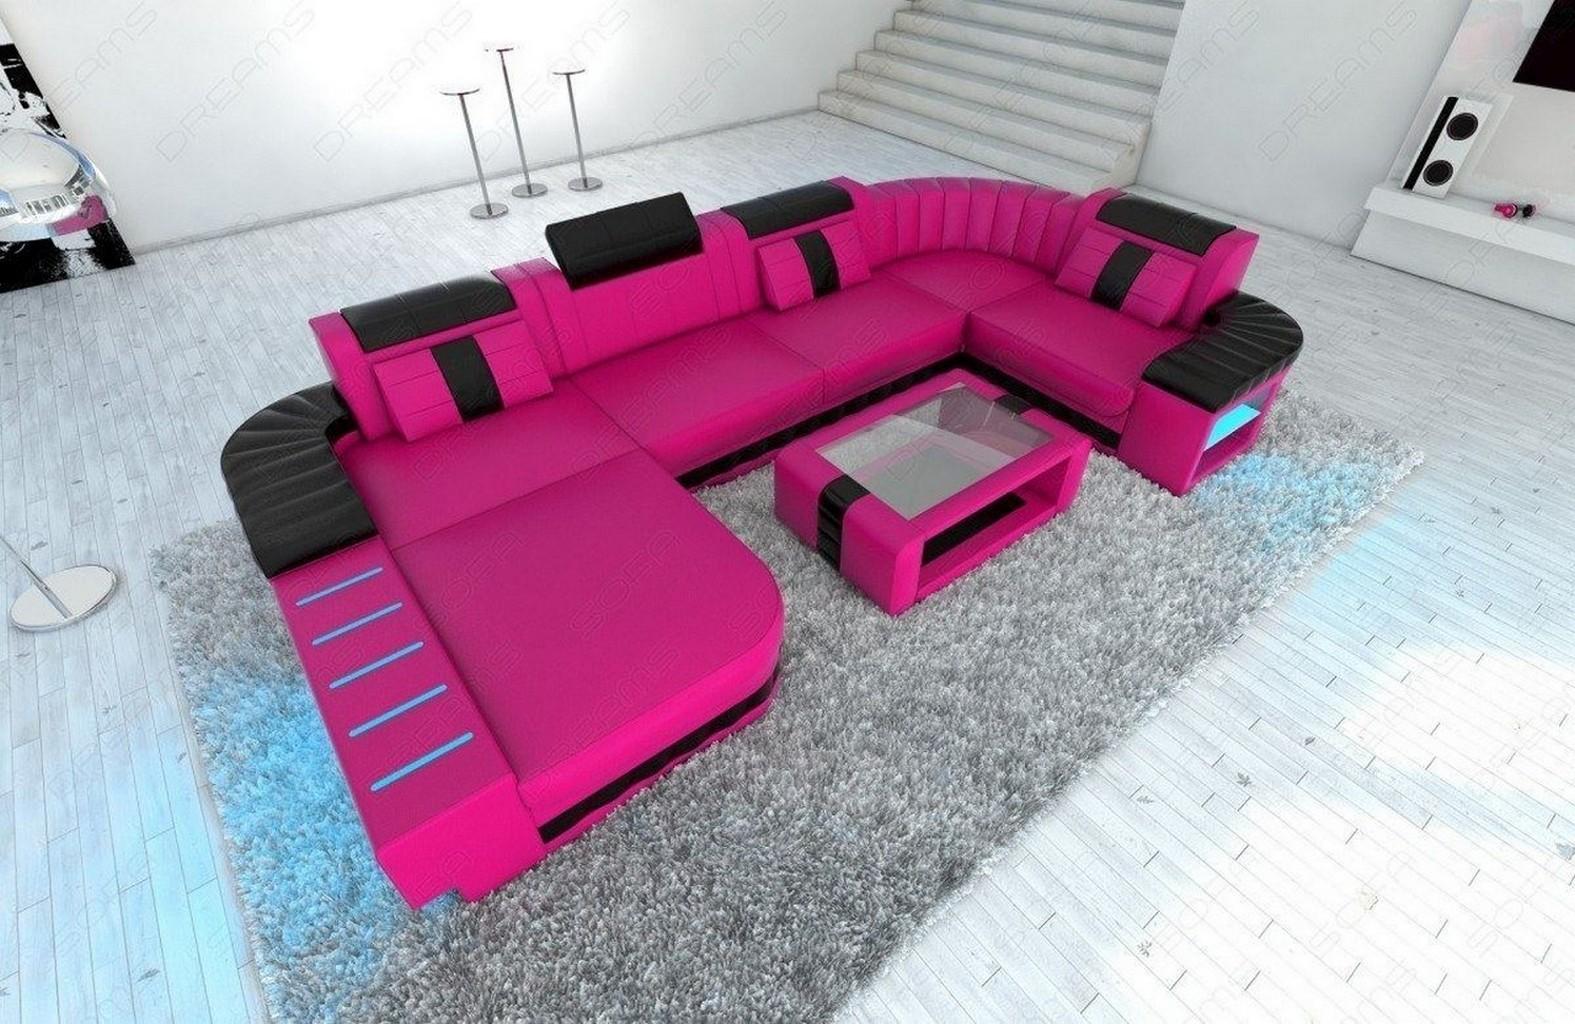 bellagio sofa bed fabric sofas. Black Bedroom Furniture Sets. Home Design Ideas